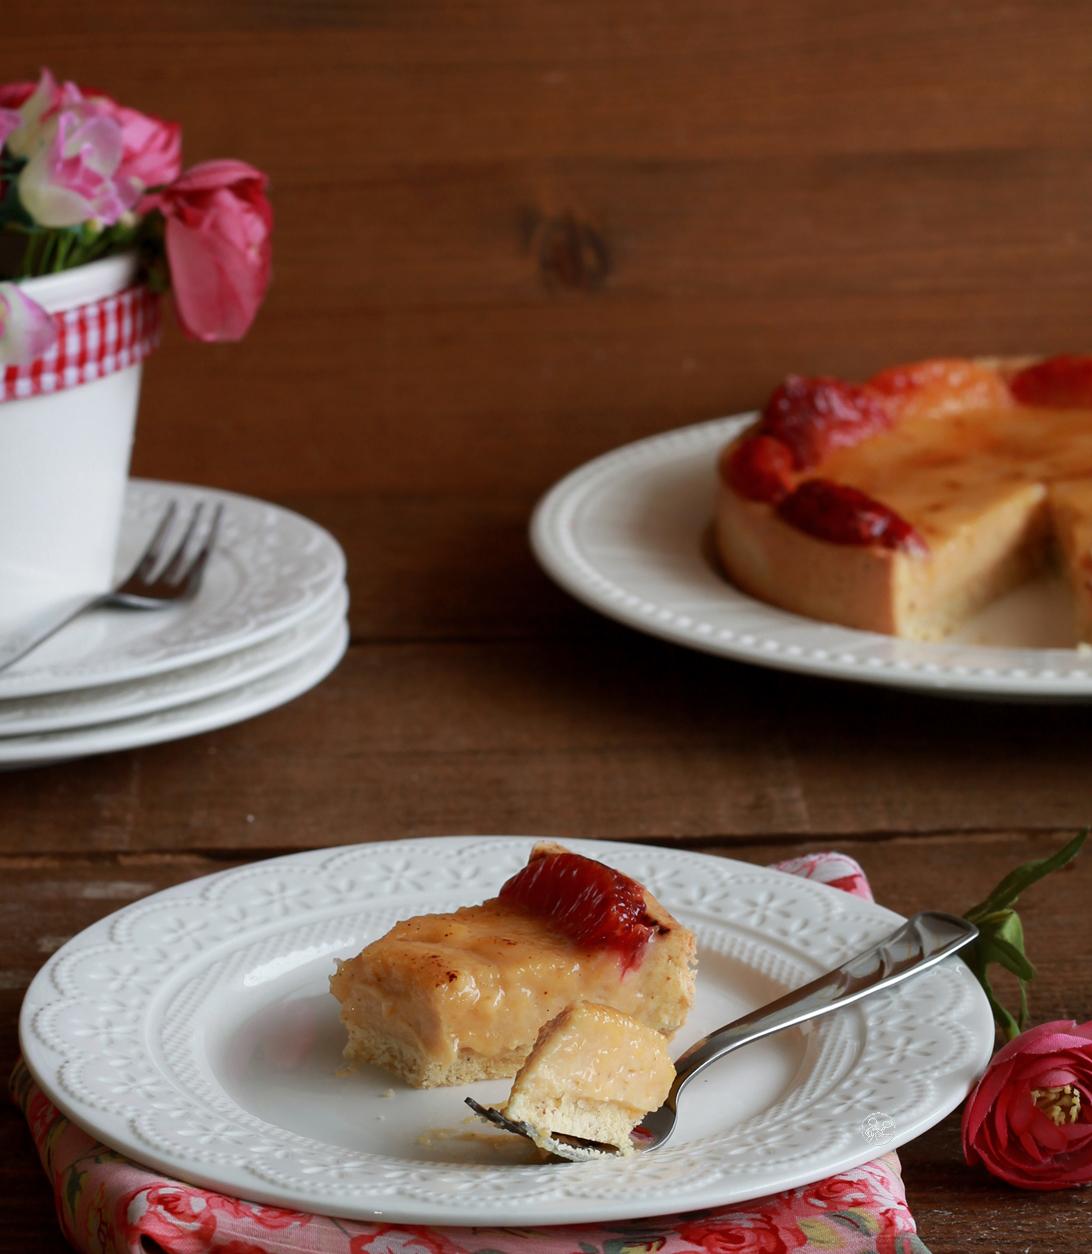 Crostata all'arancia senza glutine - La Cassata Celiaca